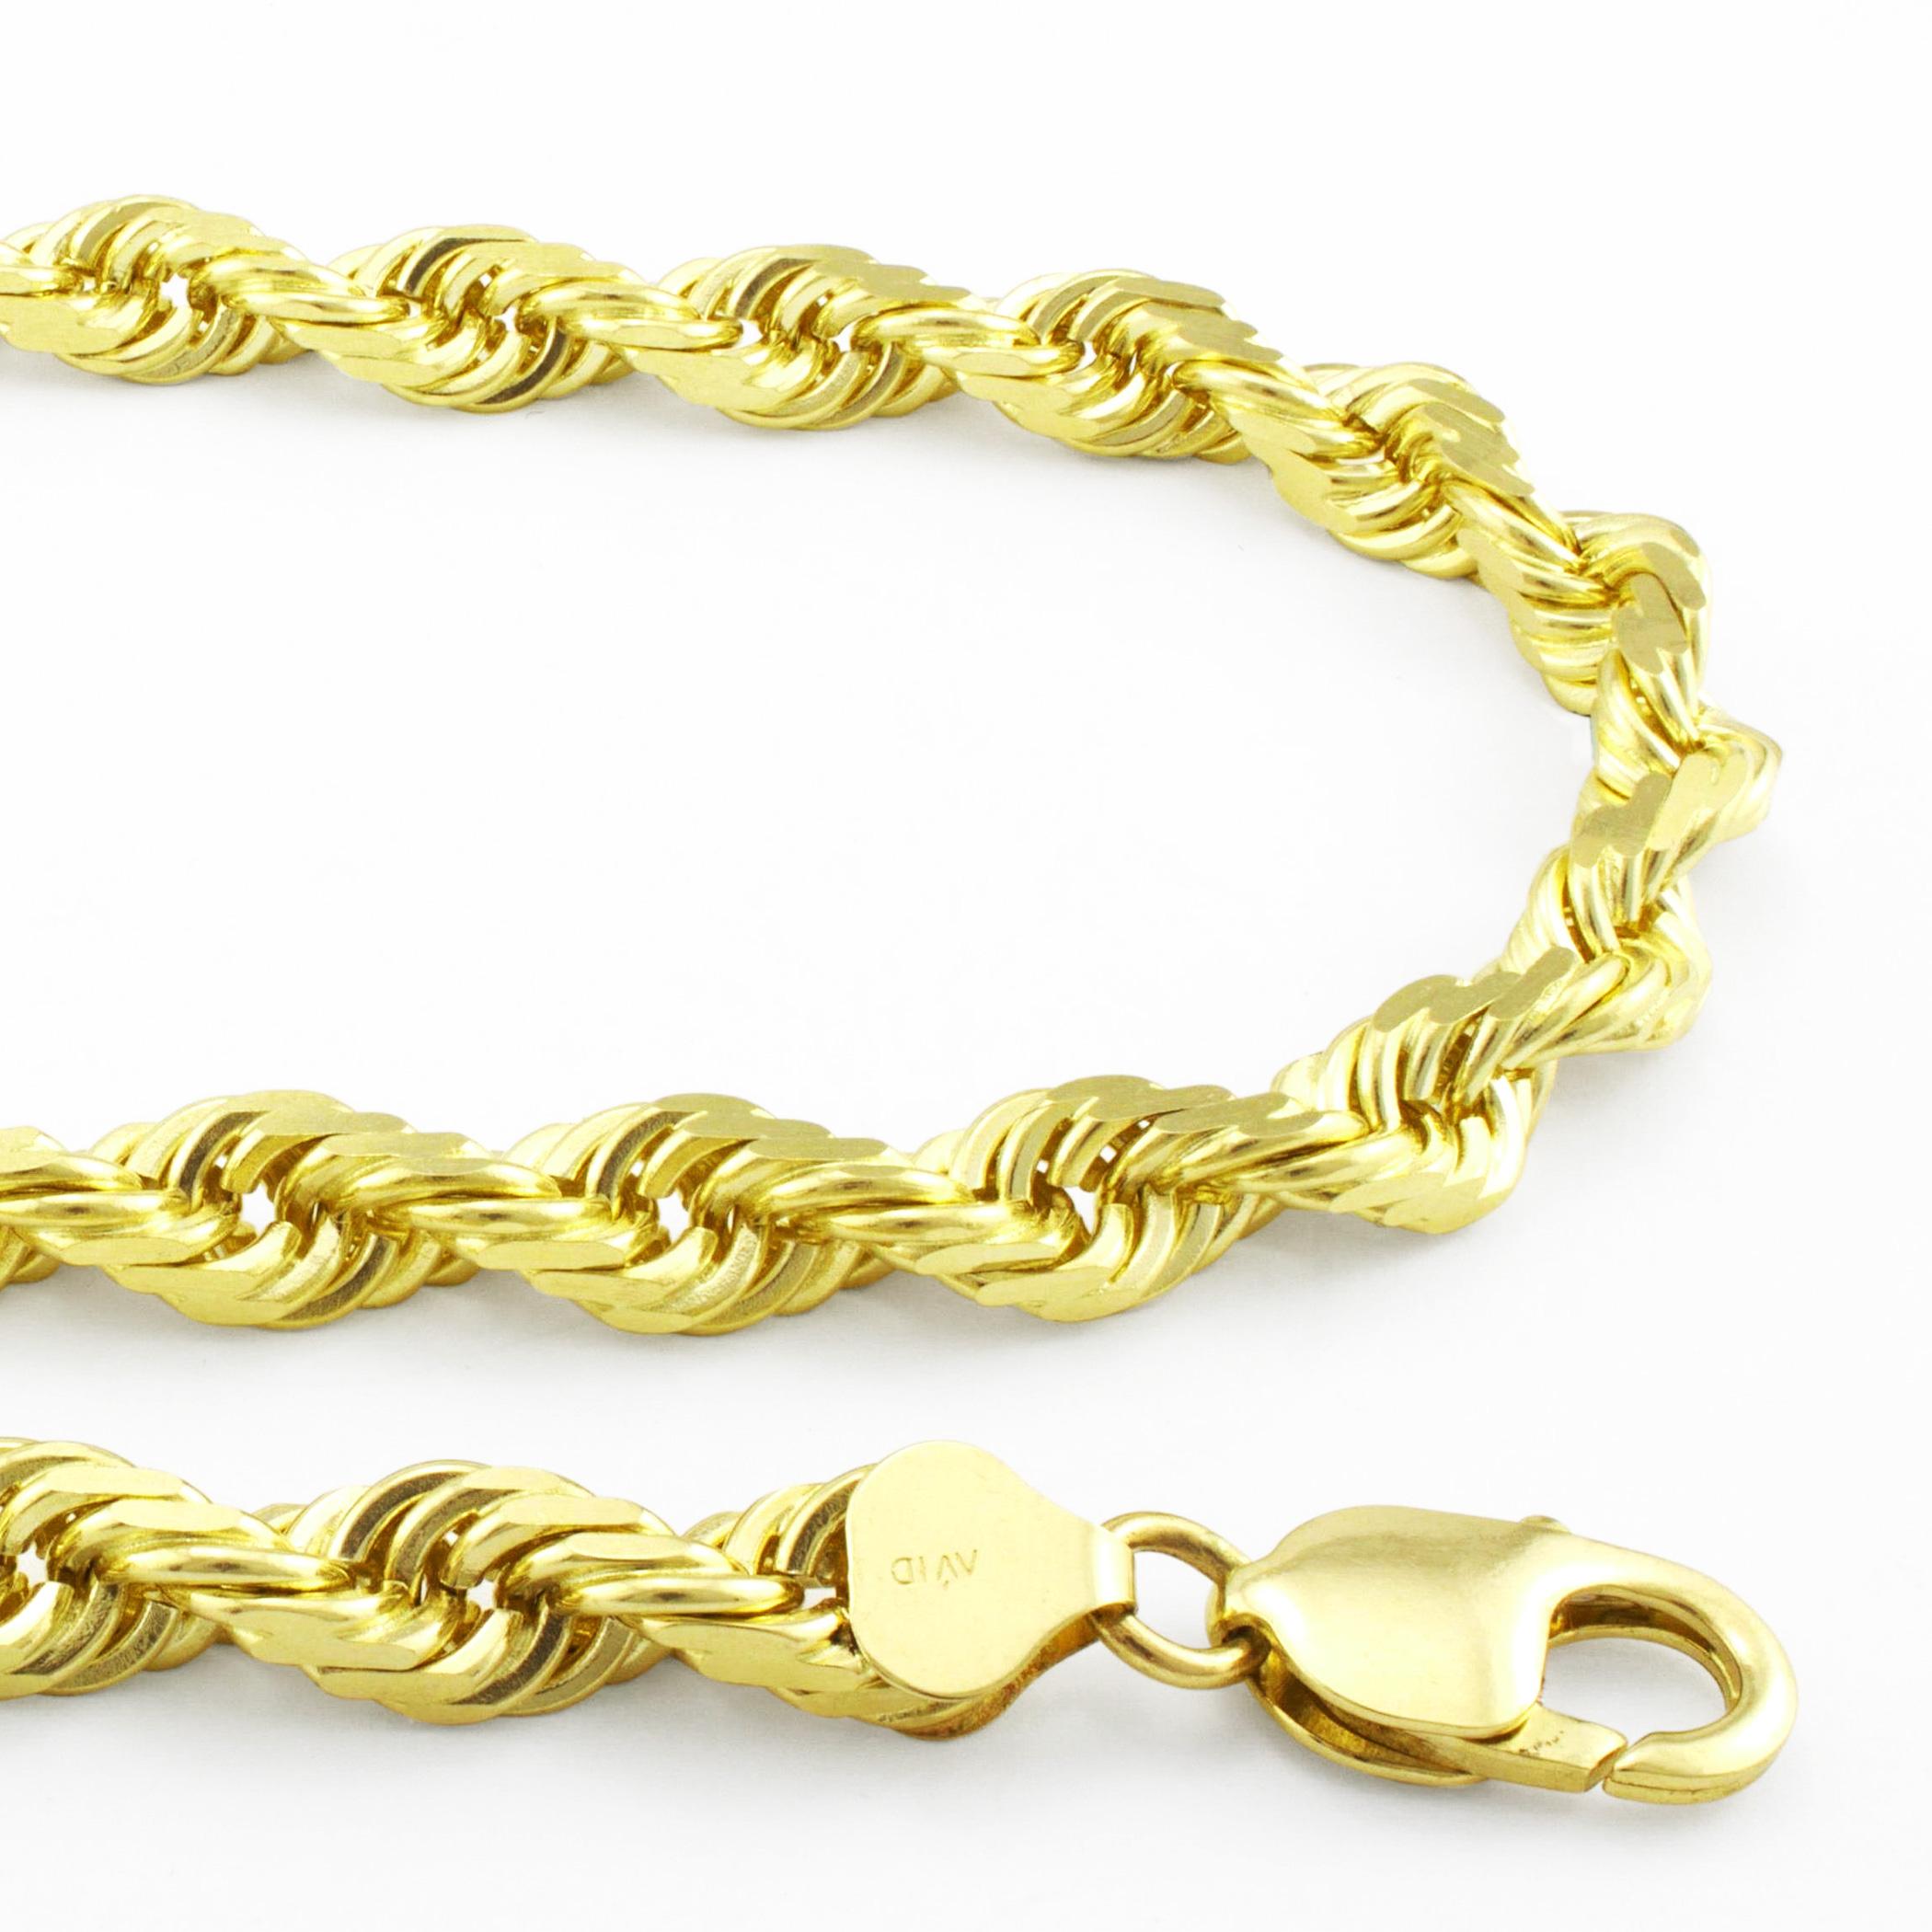 14K Diamond Cut Rope Chain 2.5Mm